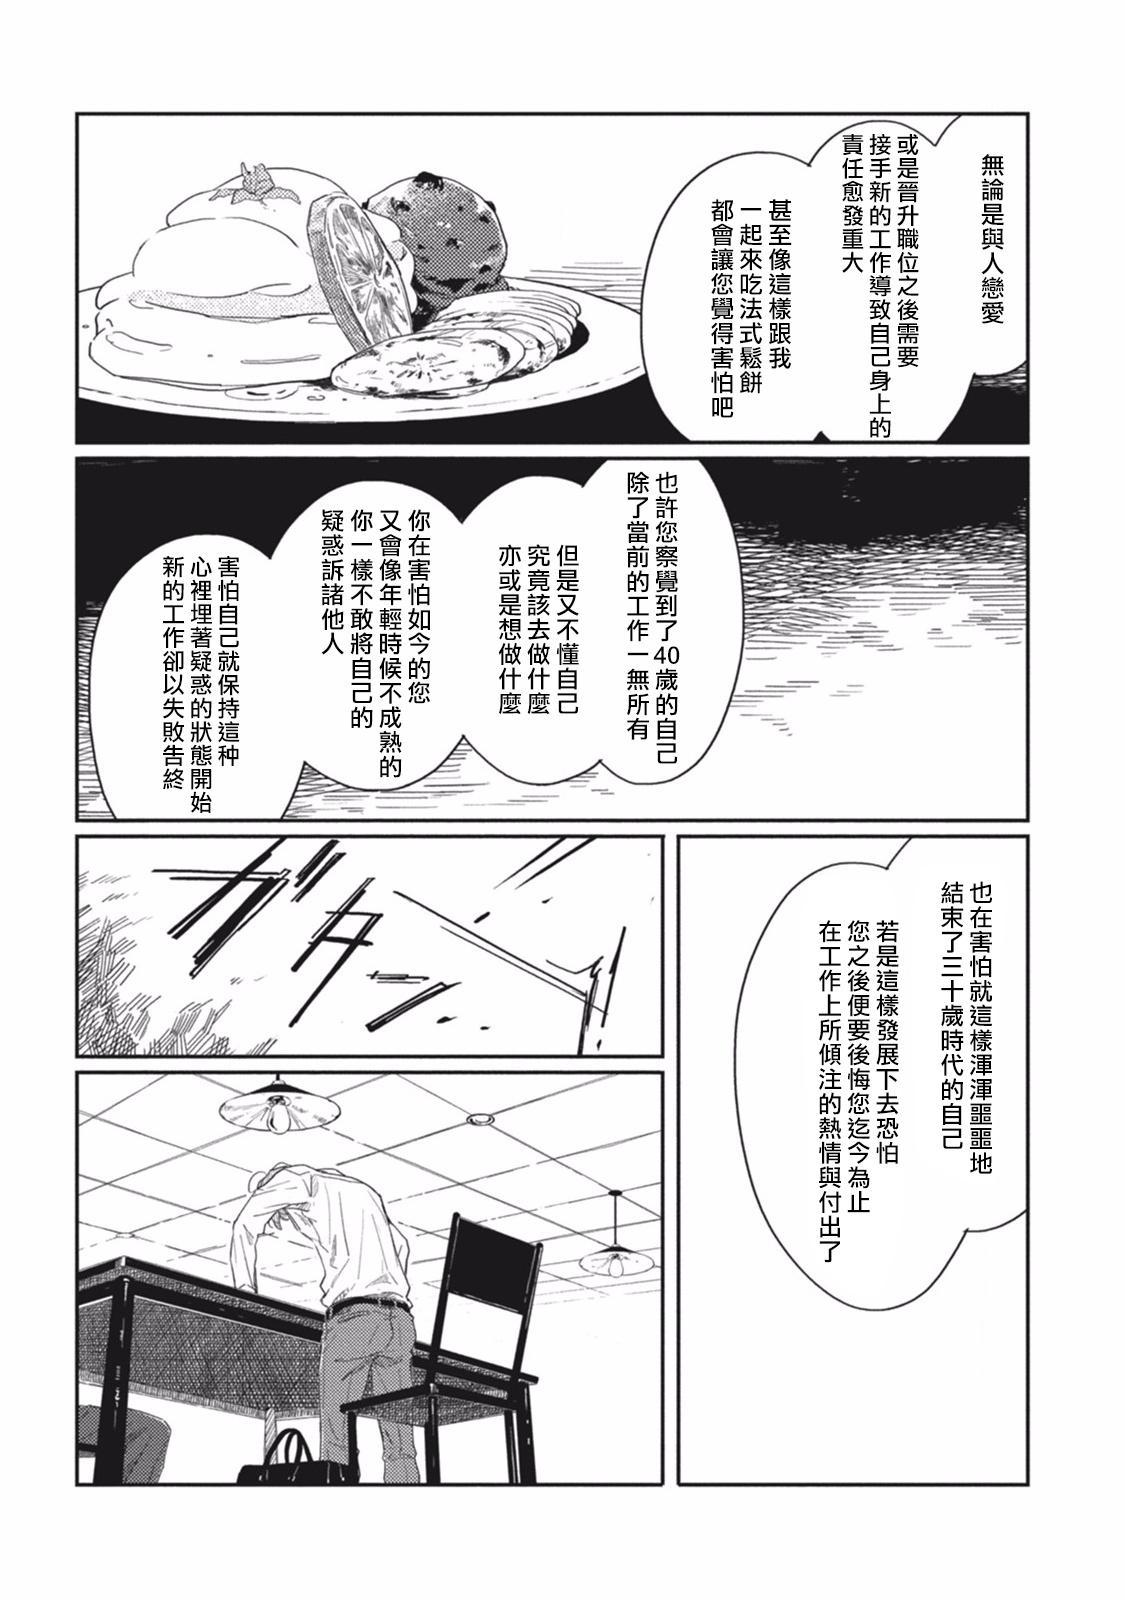 [Sagan Sagan] Old-fashioned Cupcake Ch. 1-2 [Chinese] [拾荒者汉化组] [Digital] 26